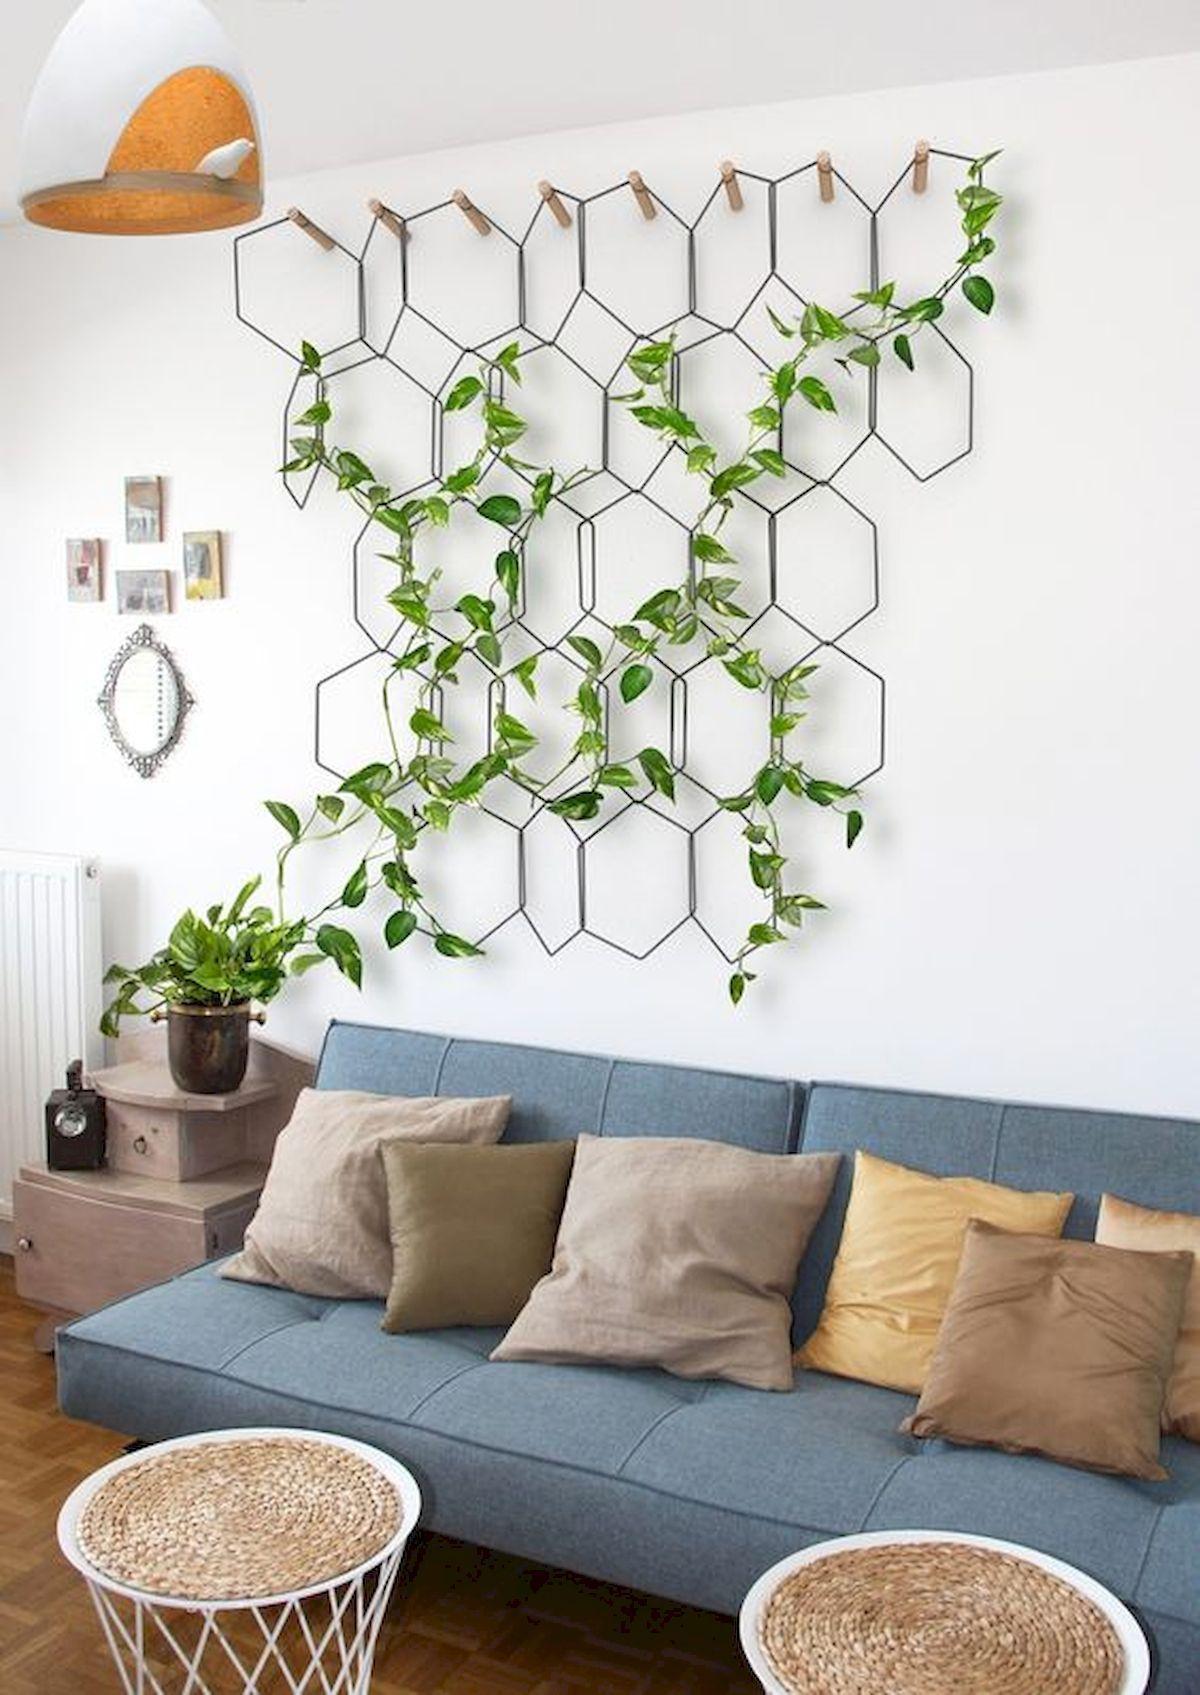 2019 Best Living Room Wall Art Ideas And Decorations 16 Plant Decor Indoor Indoor Vines Decor